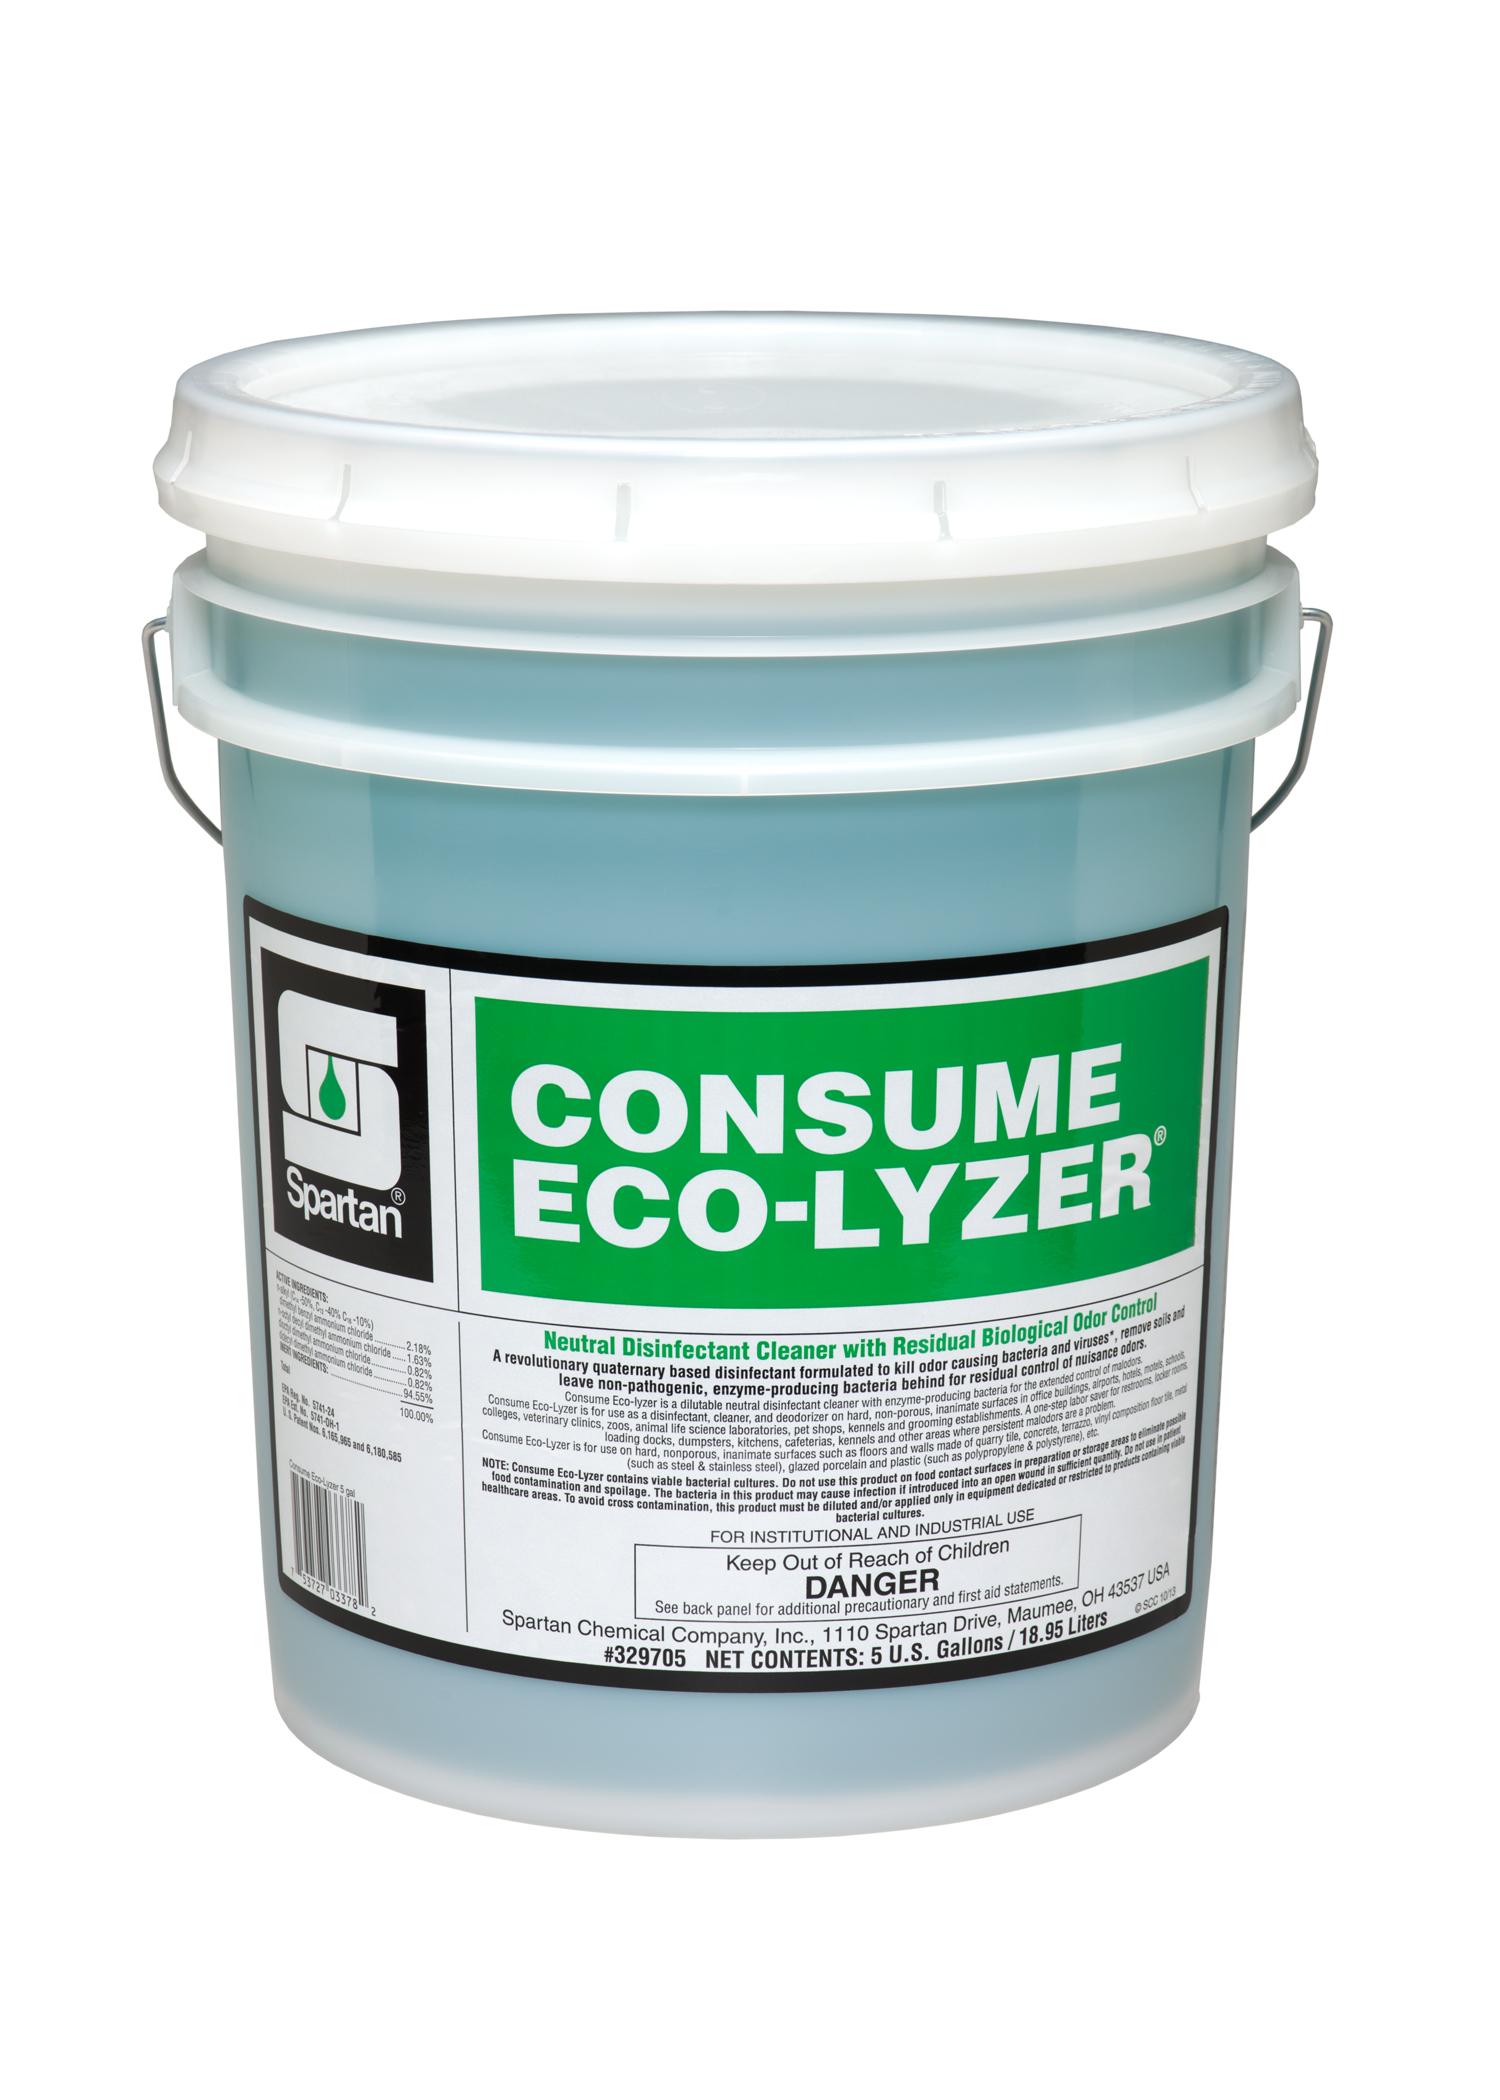 329705- Consume Ecolyzer|PL